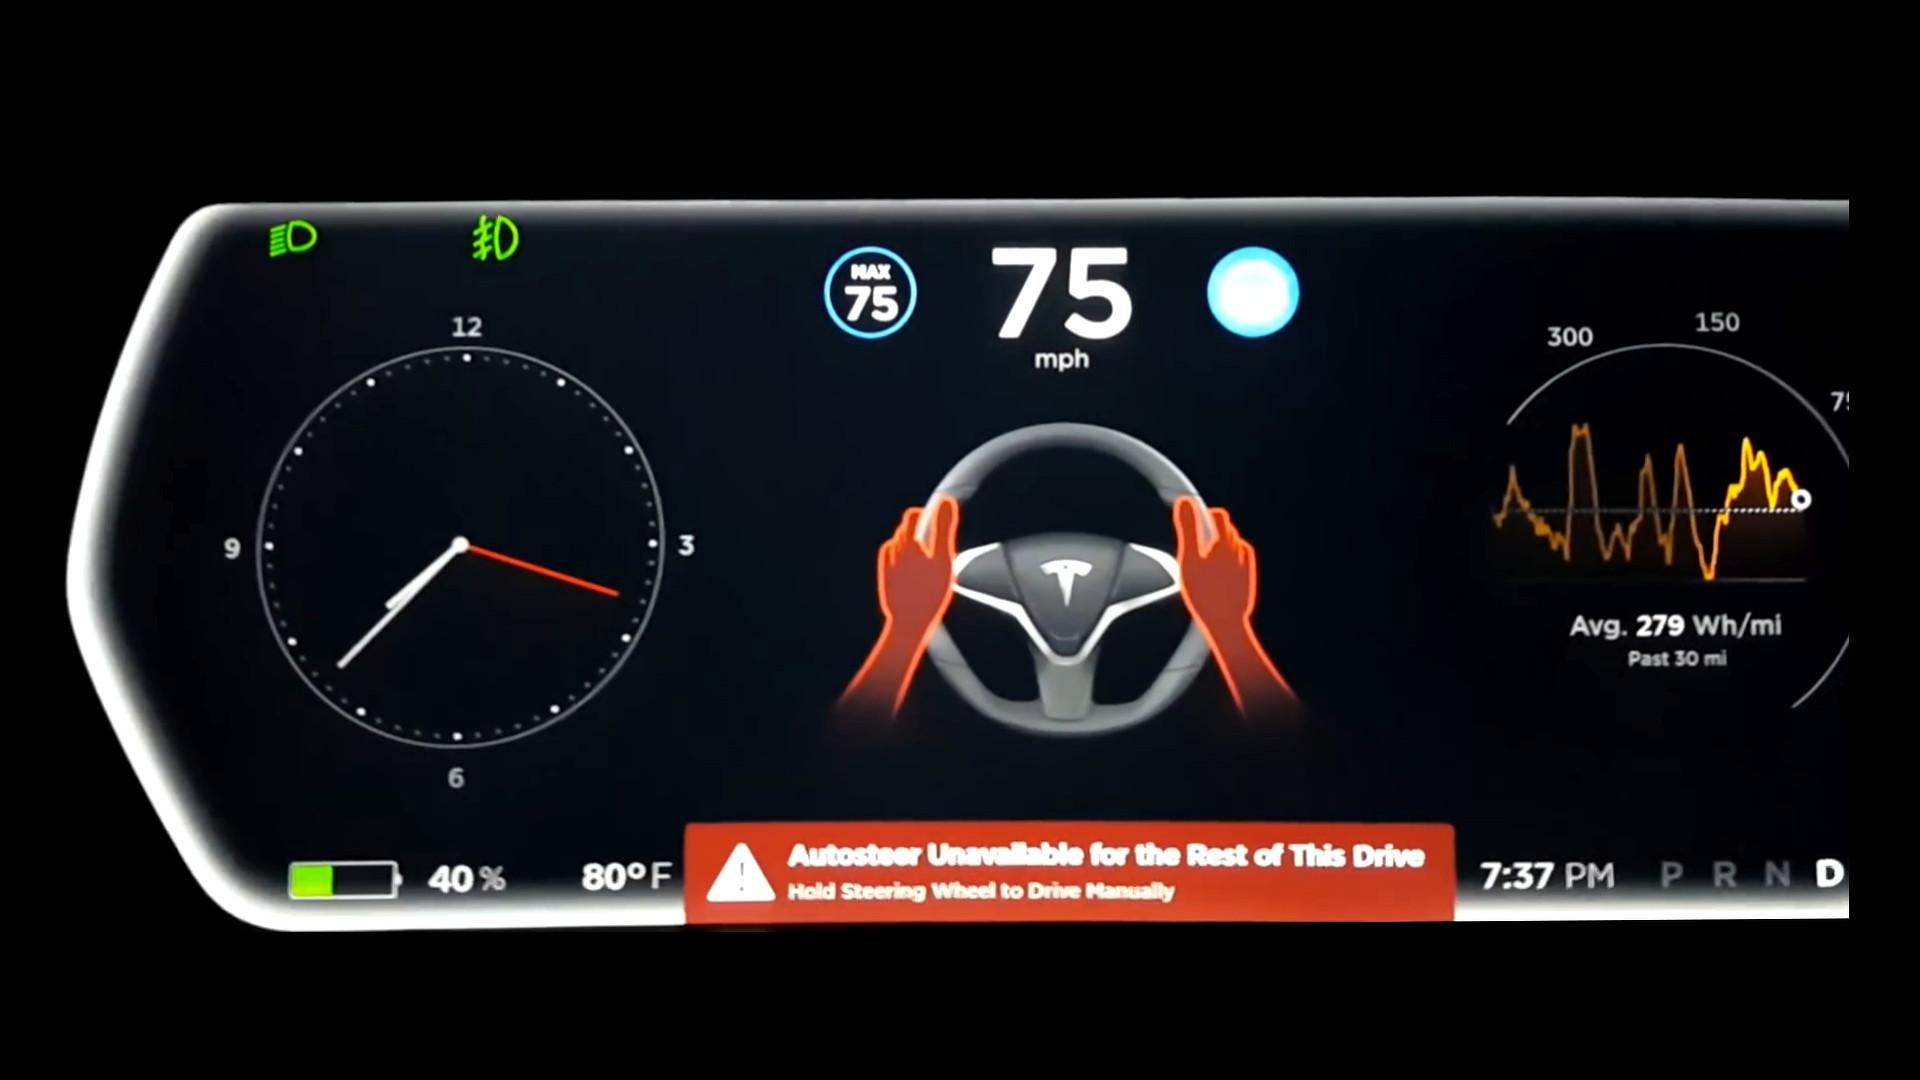 Tesla Autopilot not safe for traffic, says German government